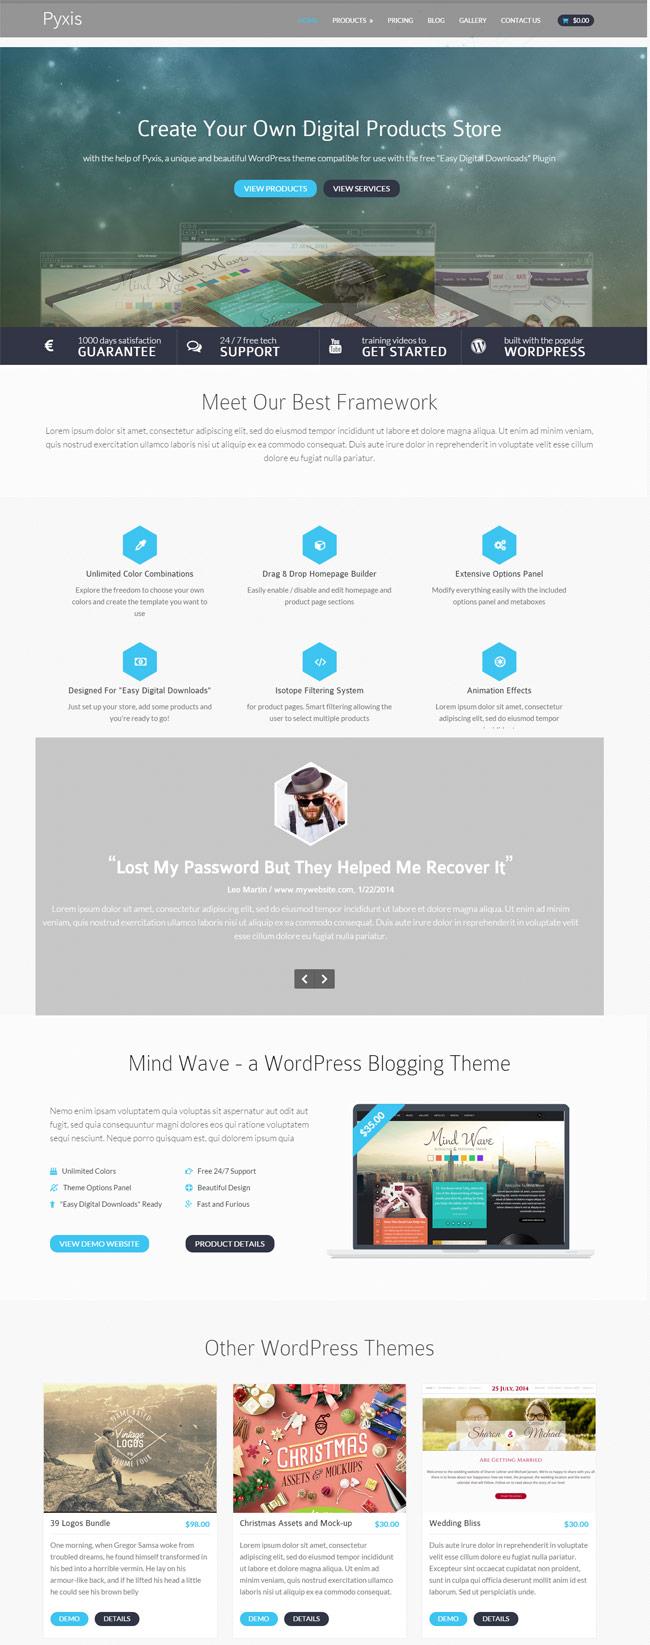 Pyxis-A-Creative-Digital-Products-Shop-Blog